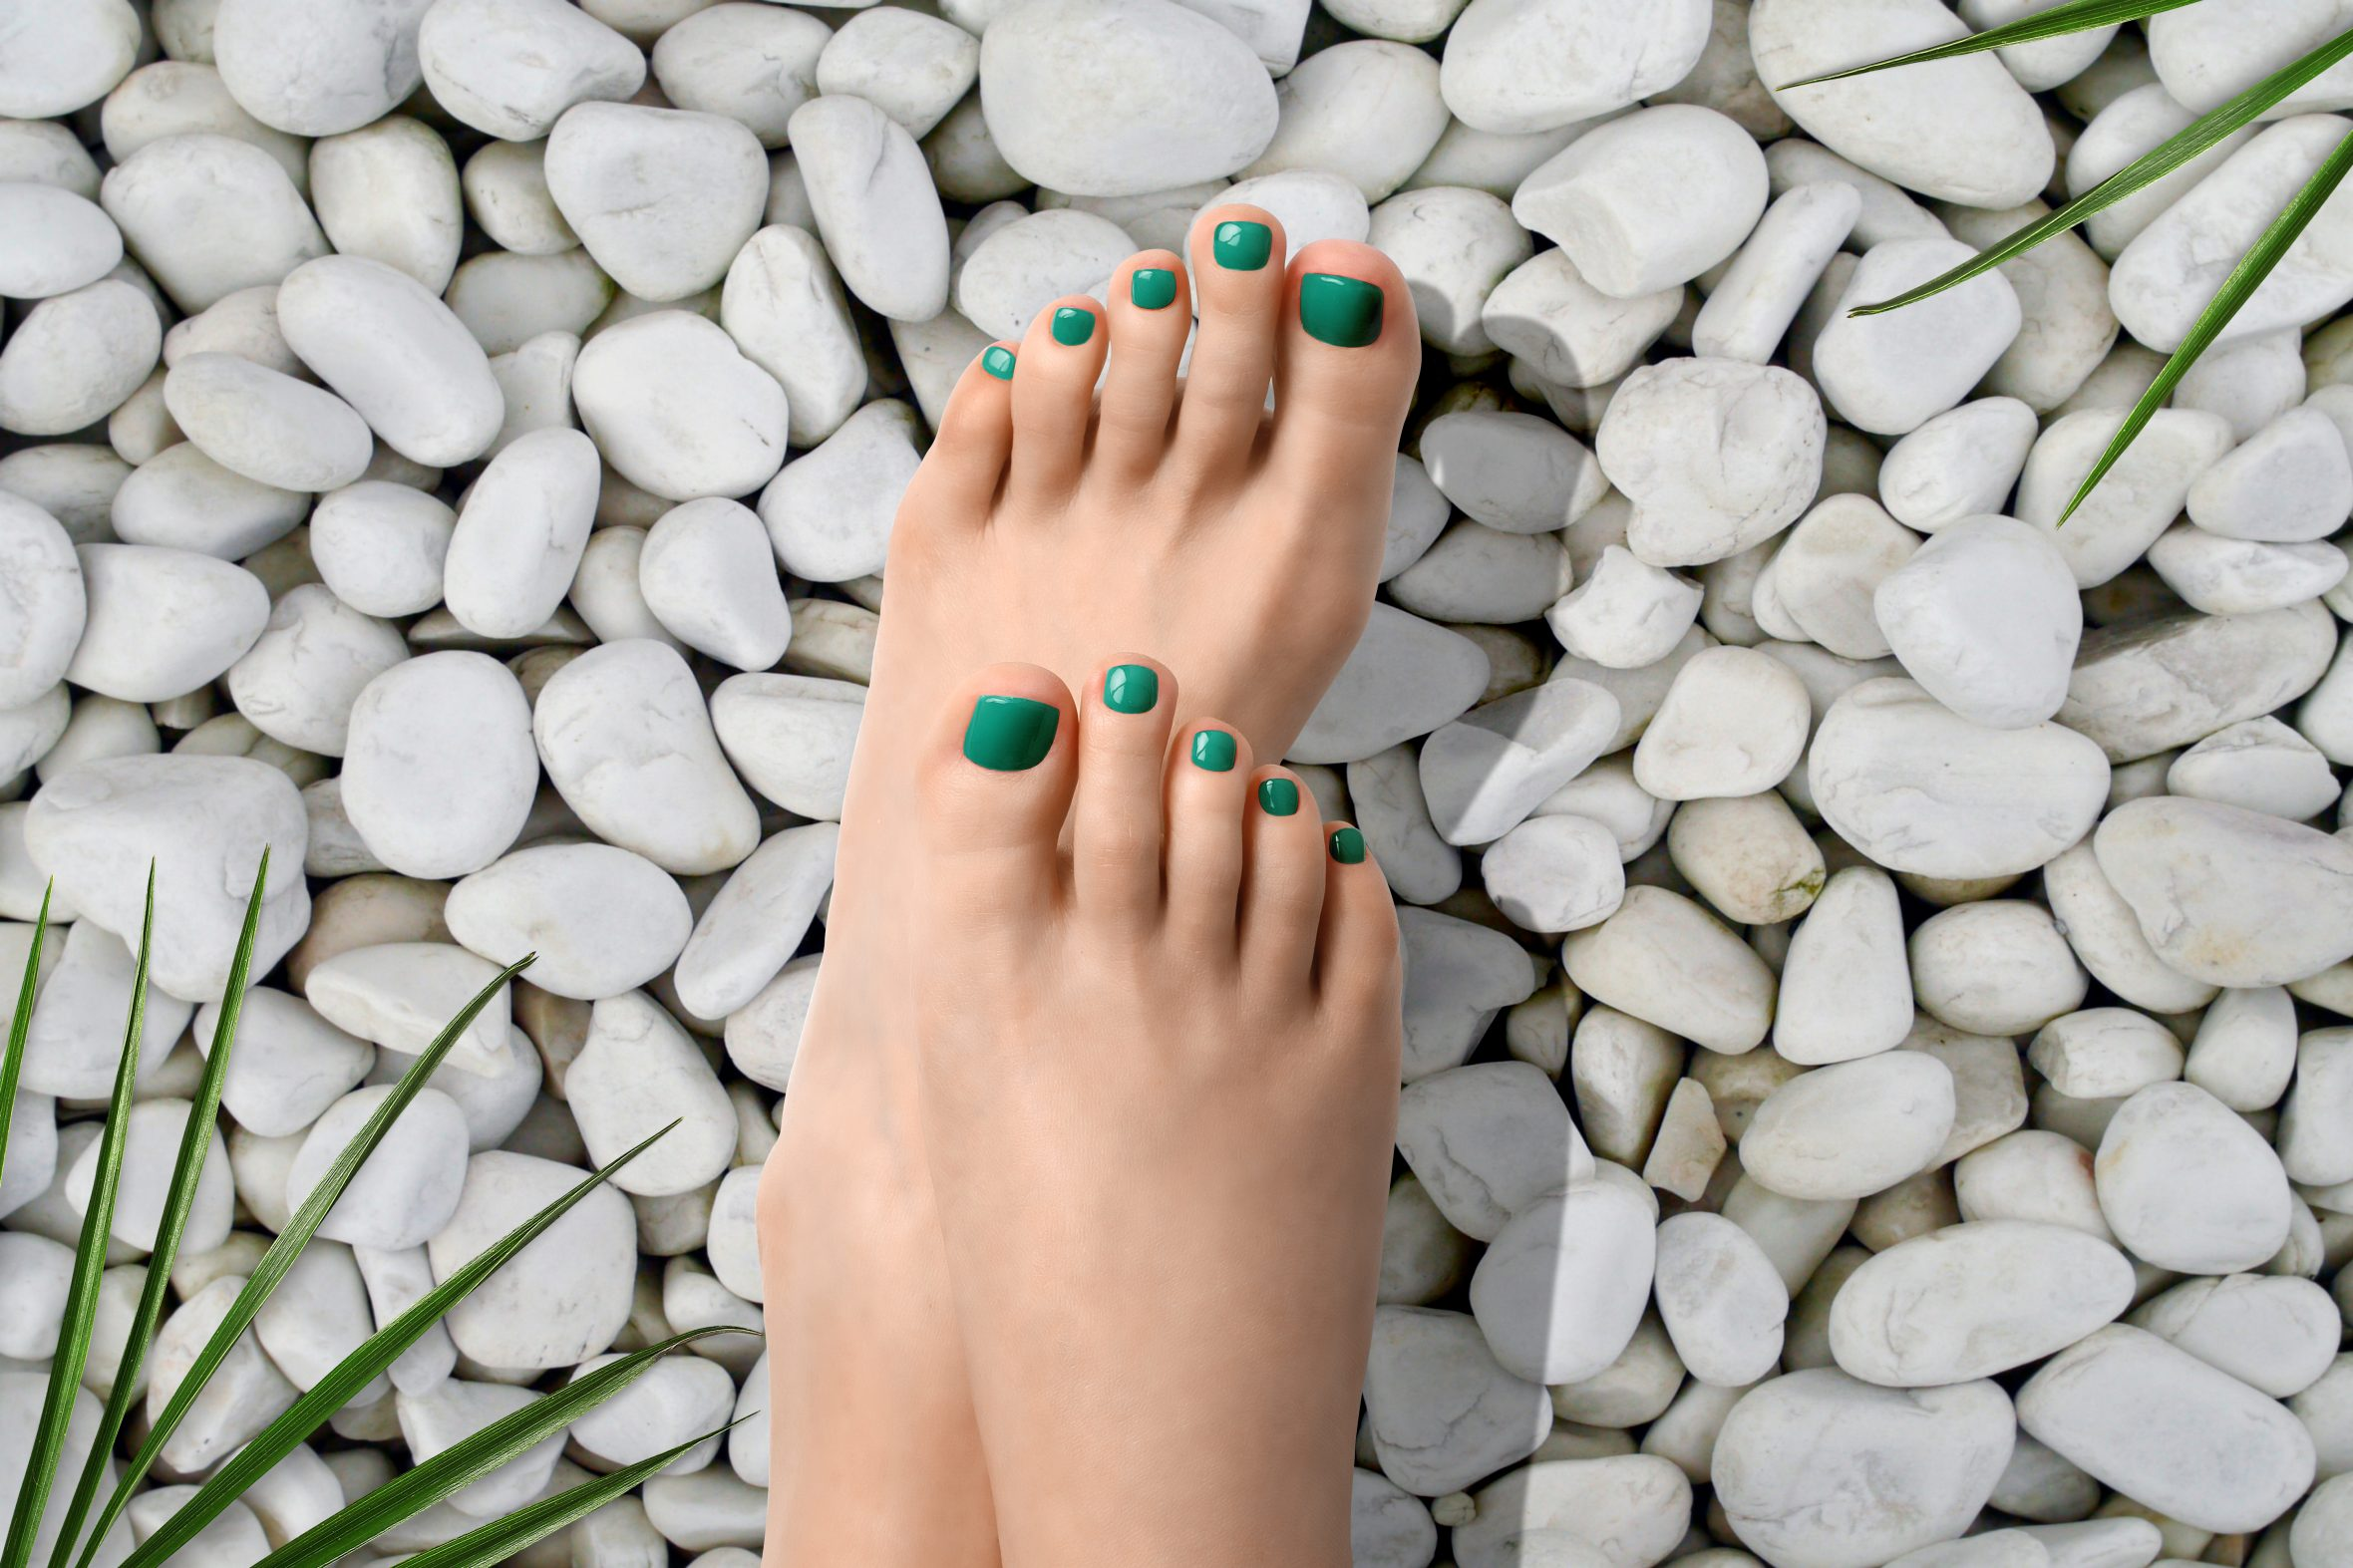 Groene nagellak van Herôme voor zomerse pedicure